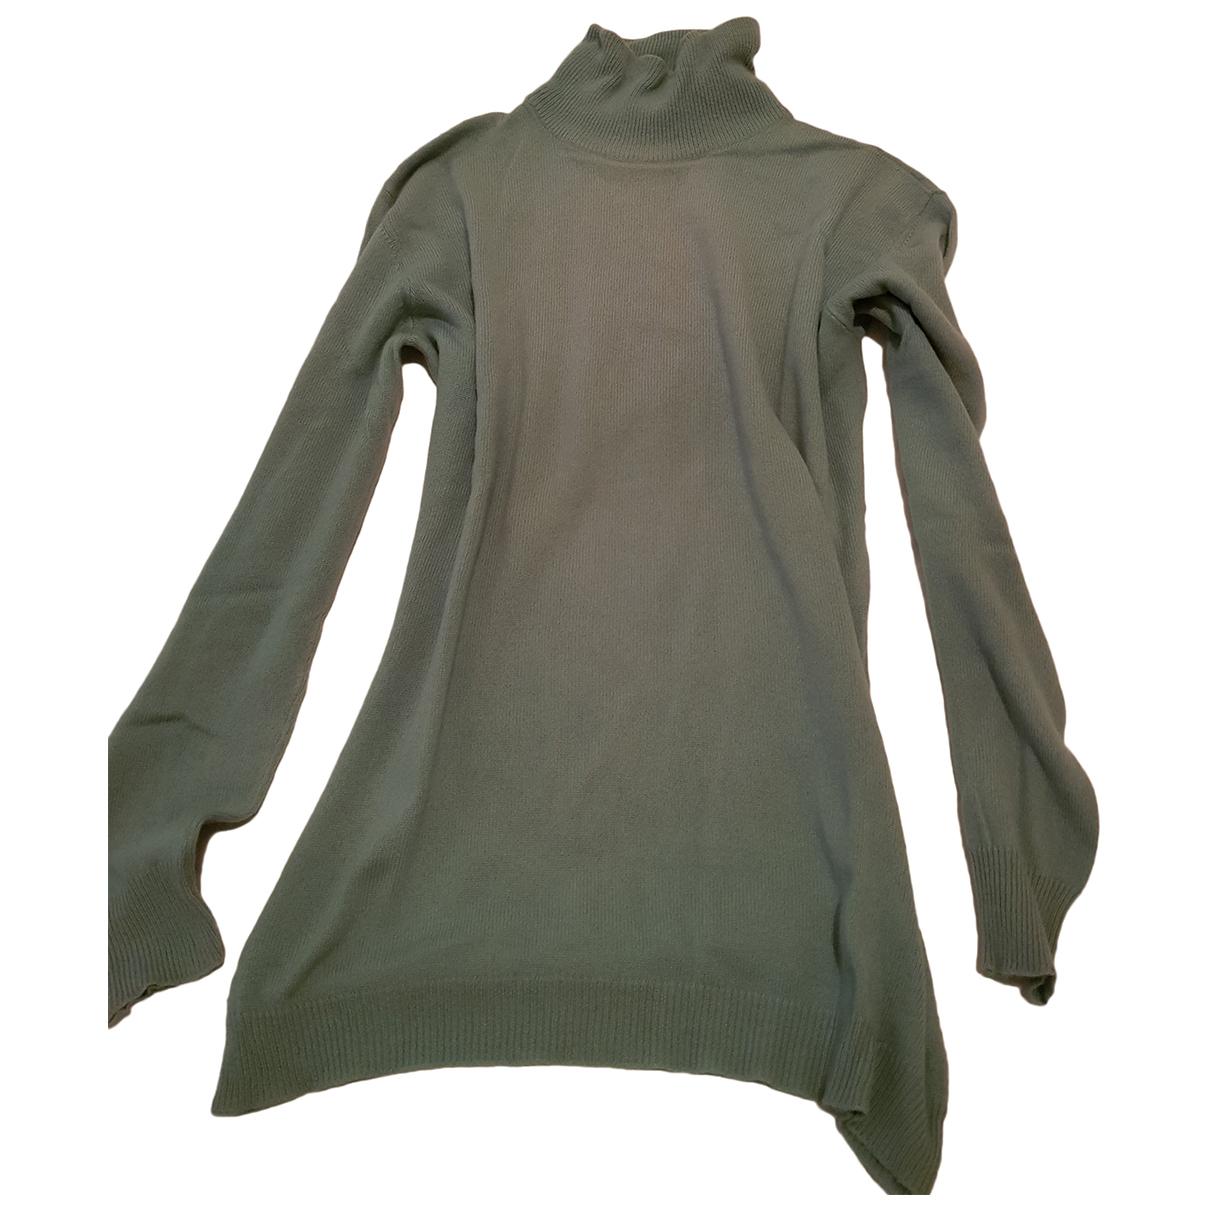 Krizia \N Turquoise Cashmere Knitwear for Women 44 IT